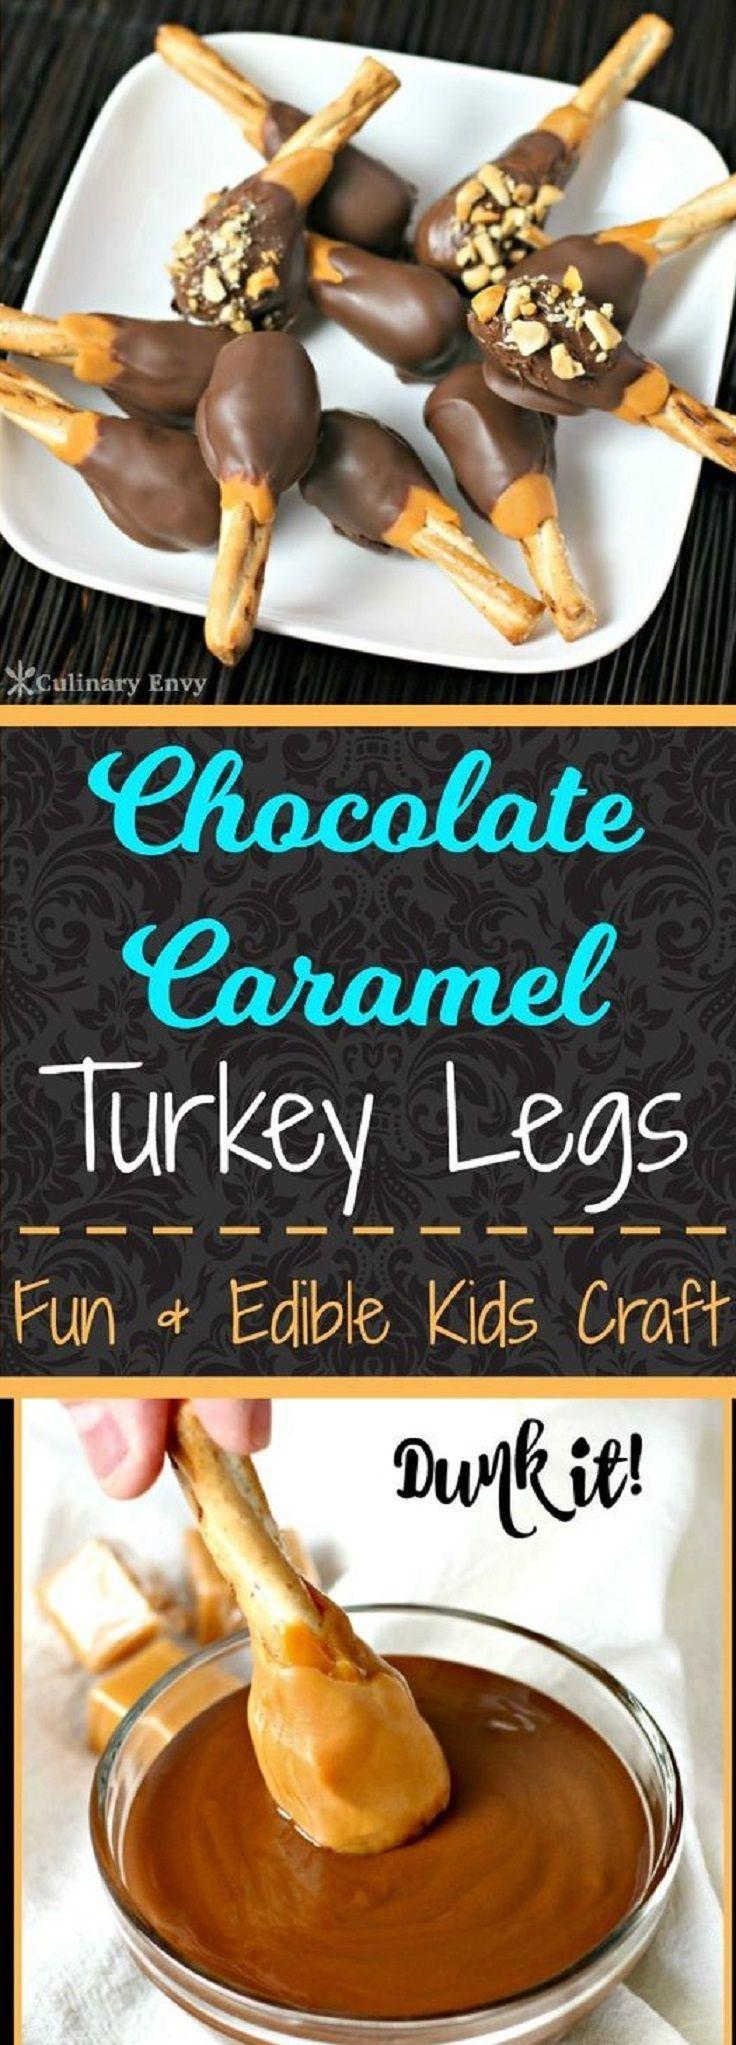 Chocolate Caramel Turkey Legs 12 Enchanting Fall